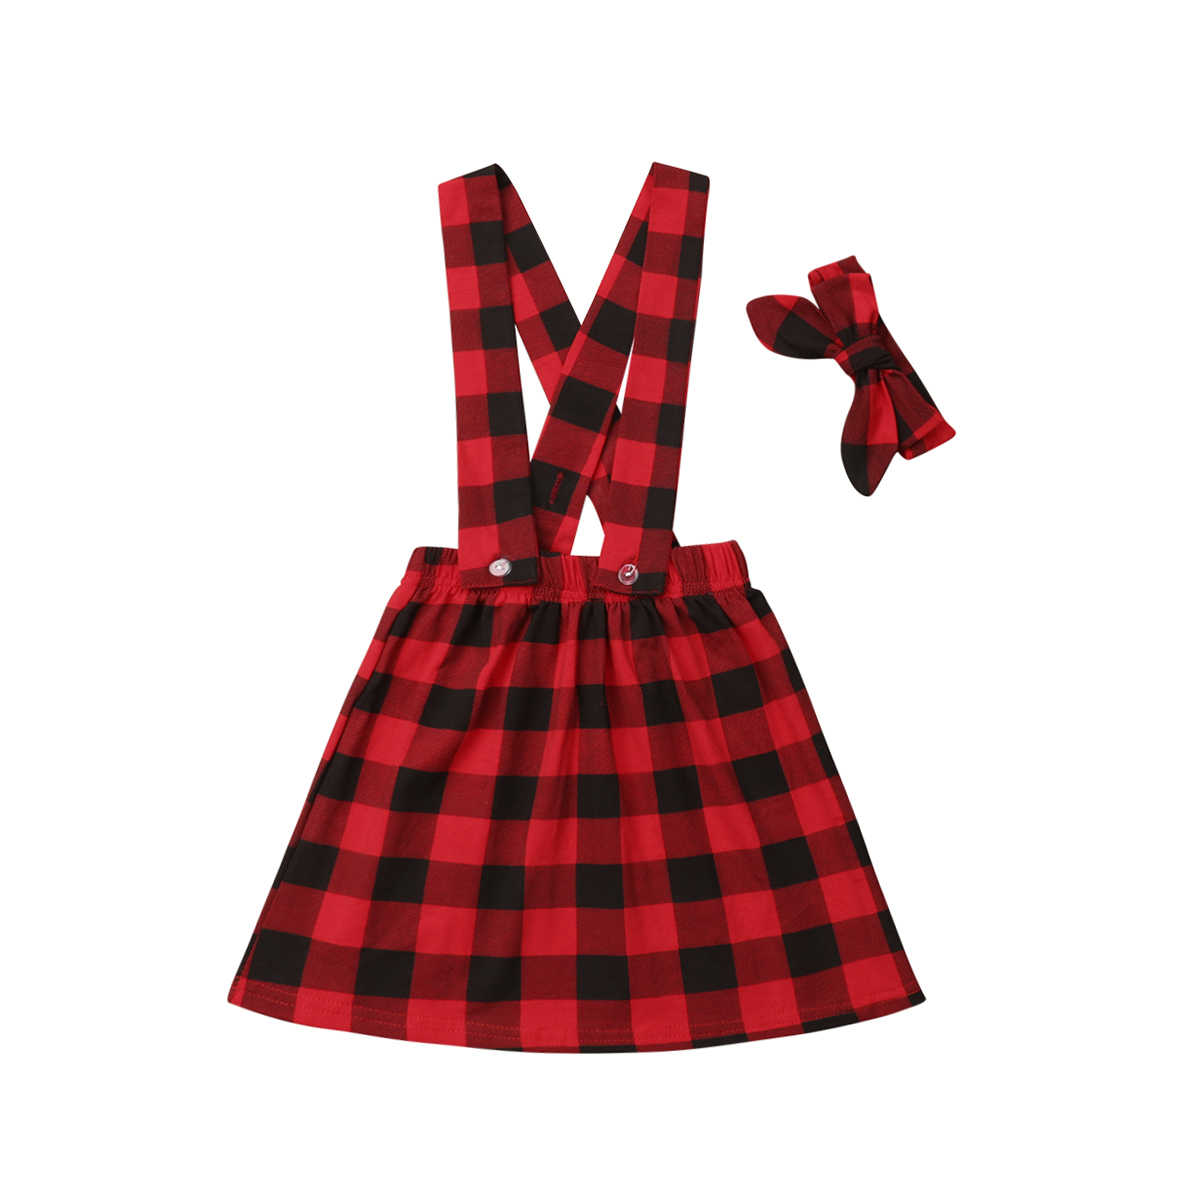 a7ebc2f38c Christmas Newborn Baby Girls Xmas Plaid Overall Suspenders Dress Headband  Outfits Clothes